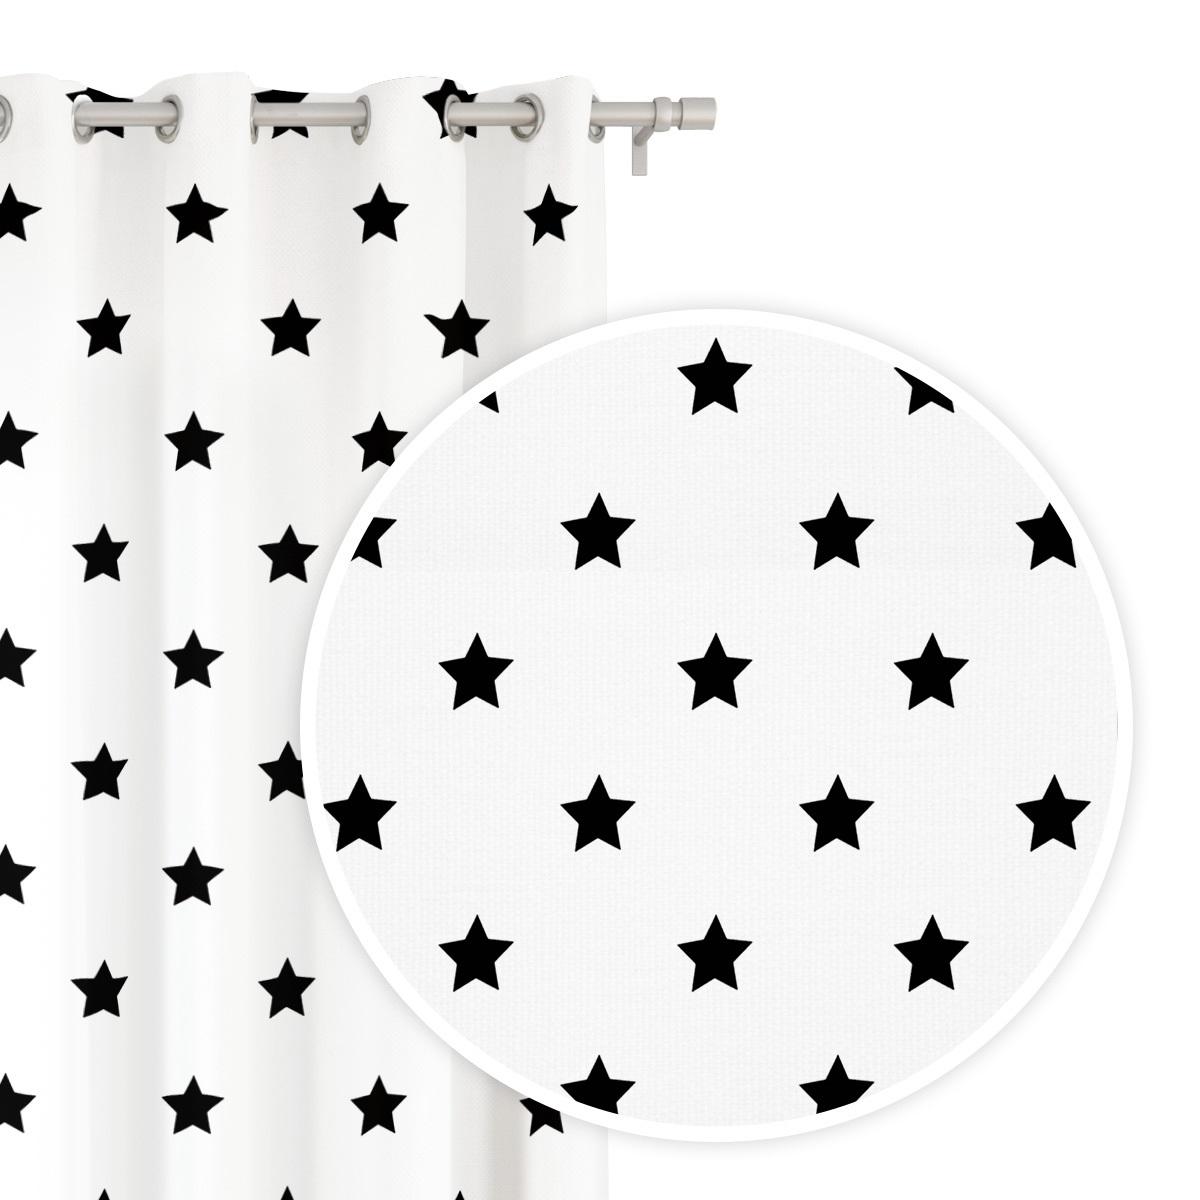 Záves STARS WHITE / 140 x 250 cm